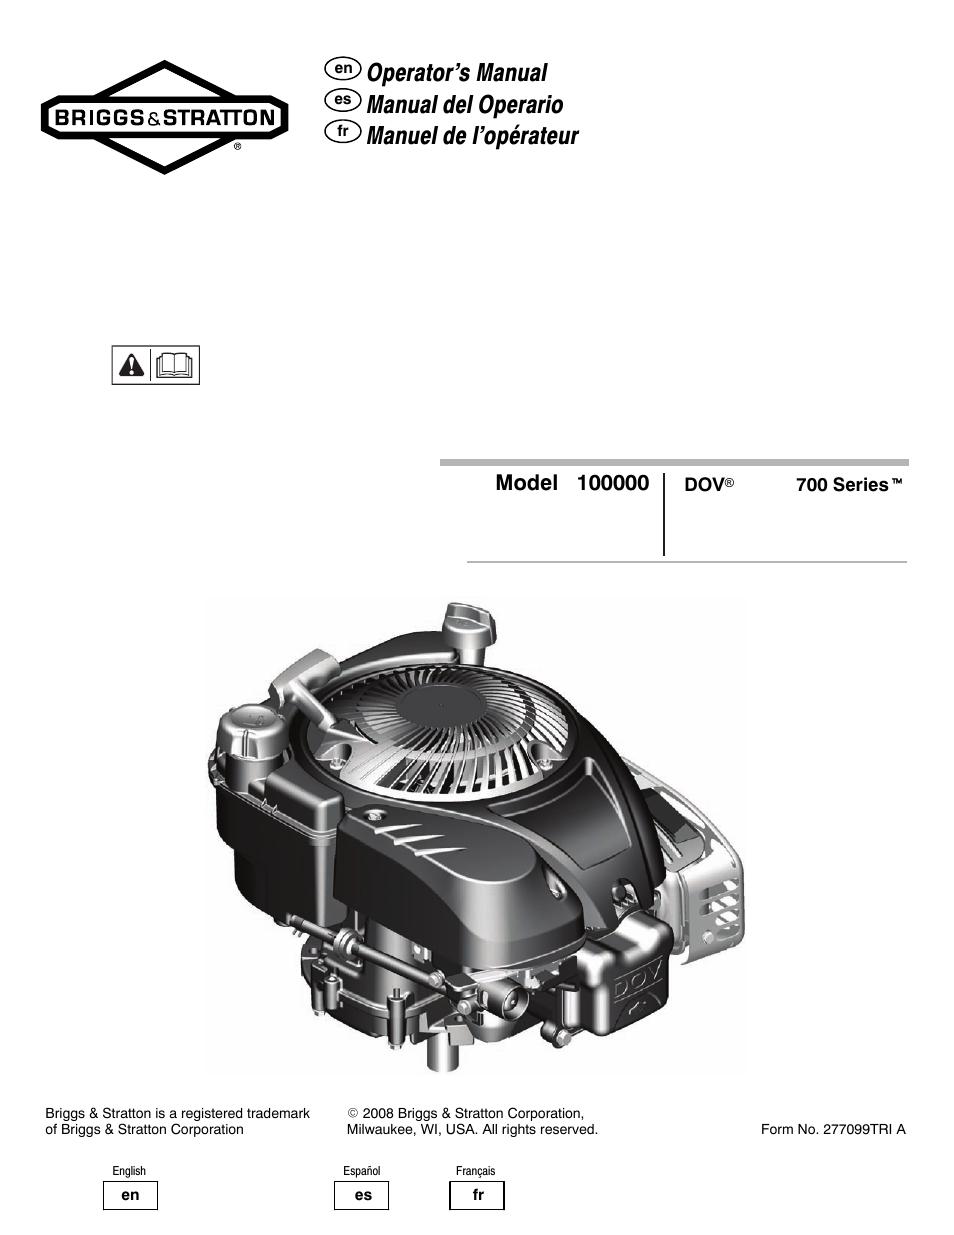 Briggs Manual Ford Focus Engine Diagram Zetece 1820 L 16v U0026 Stratton Pressure Washer Owners Array 100000 User 28 Pages Rh Manualsdir